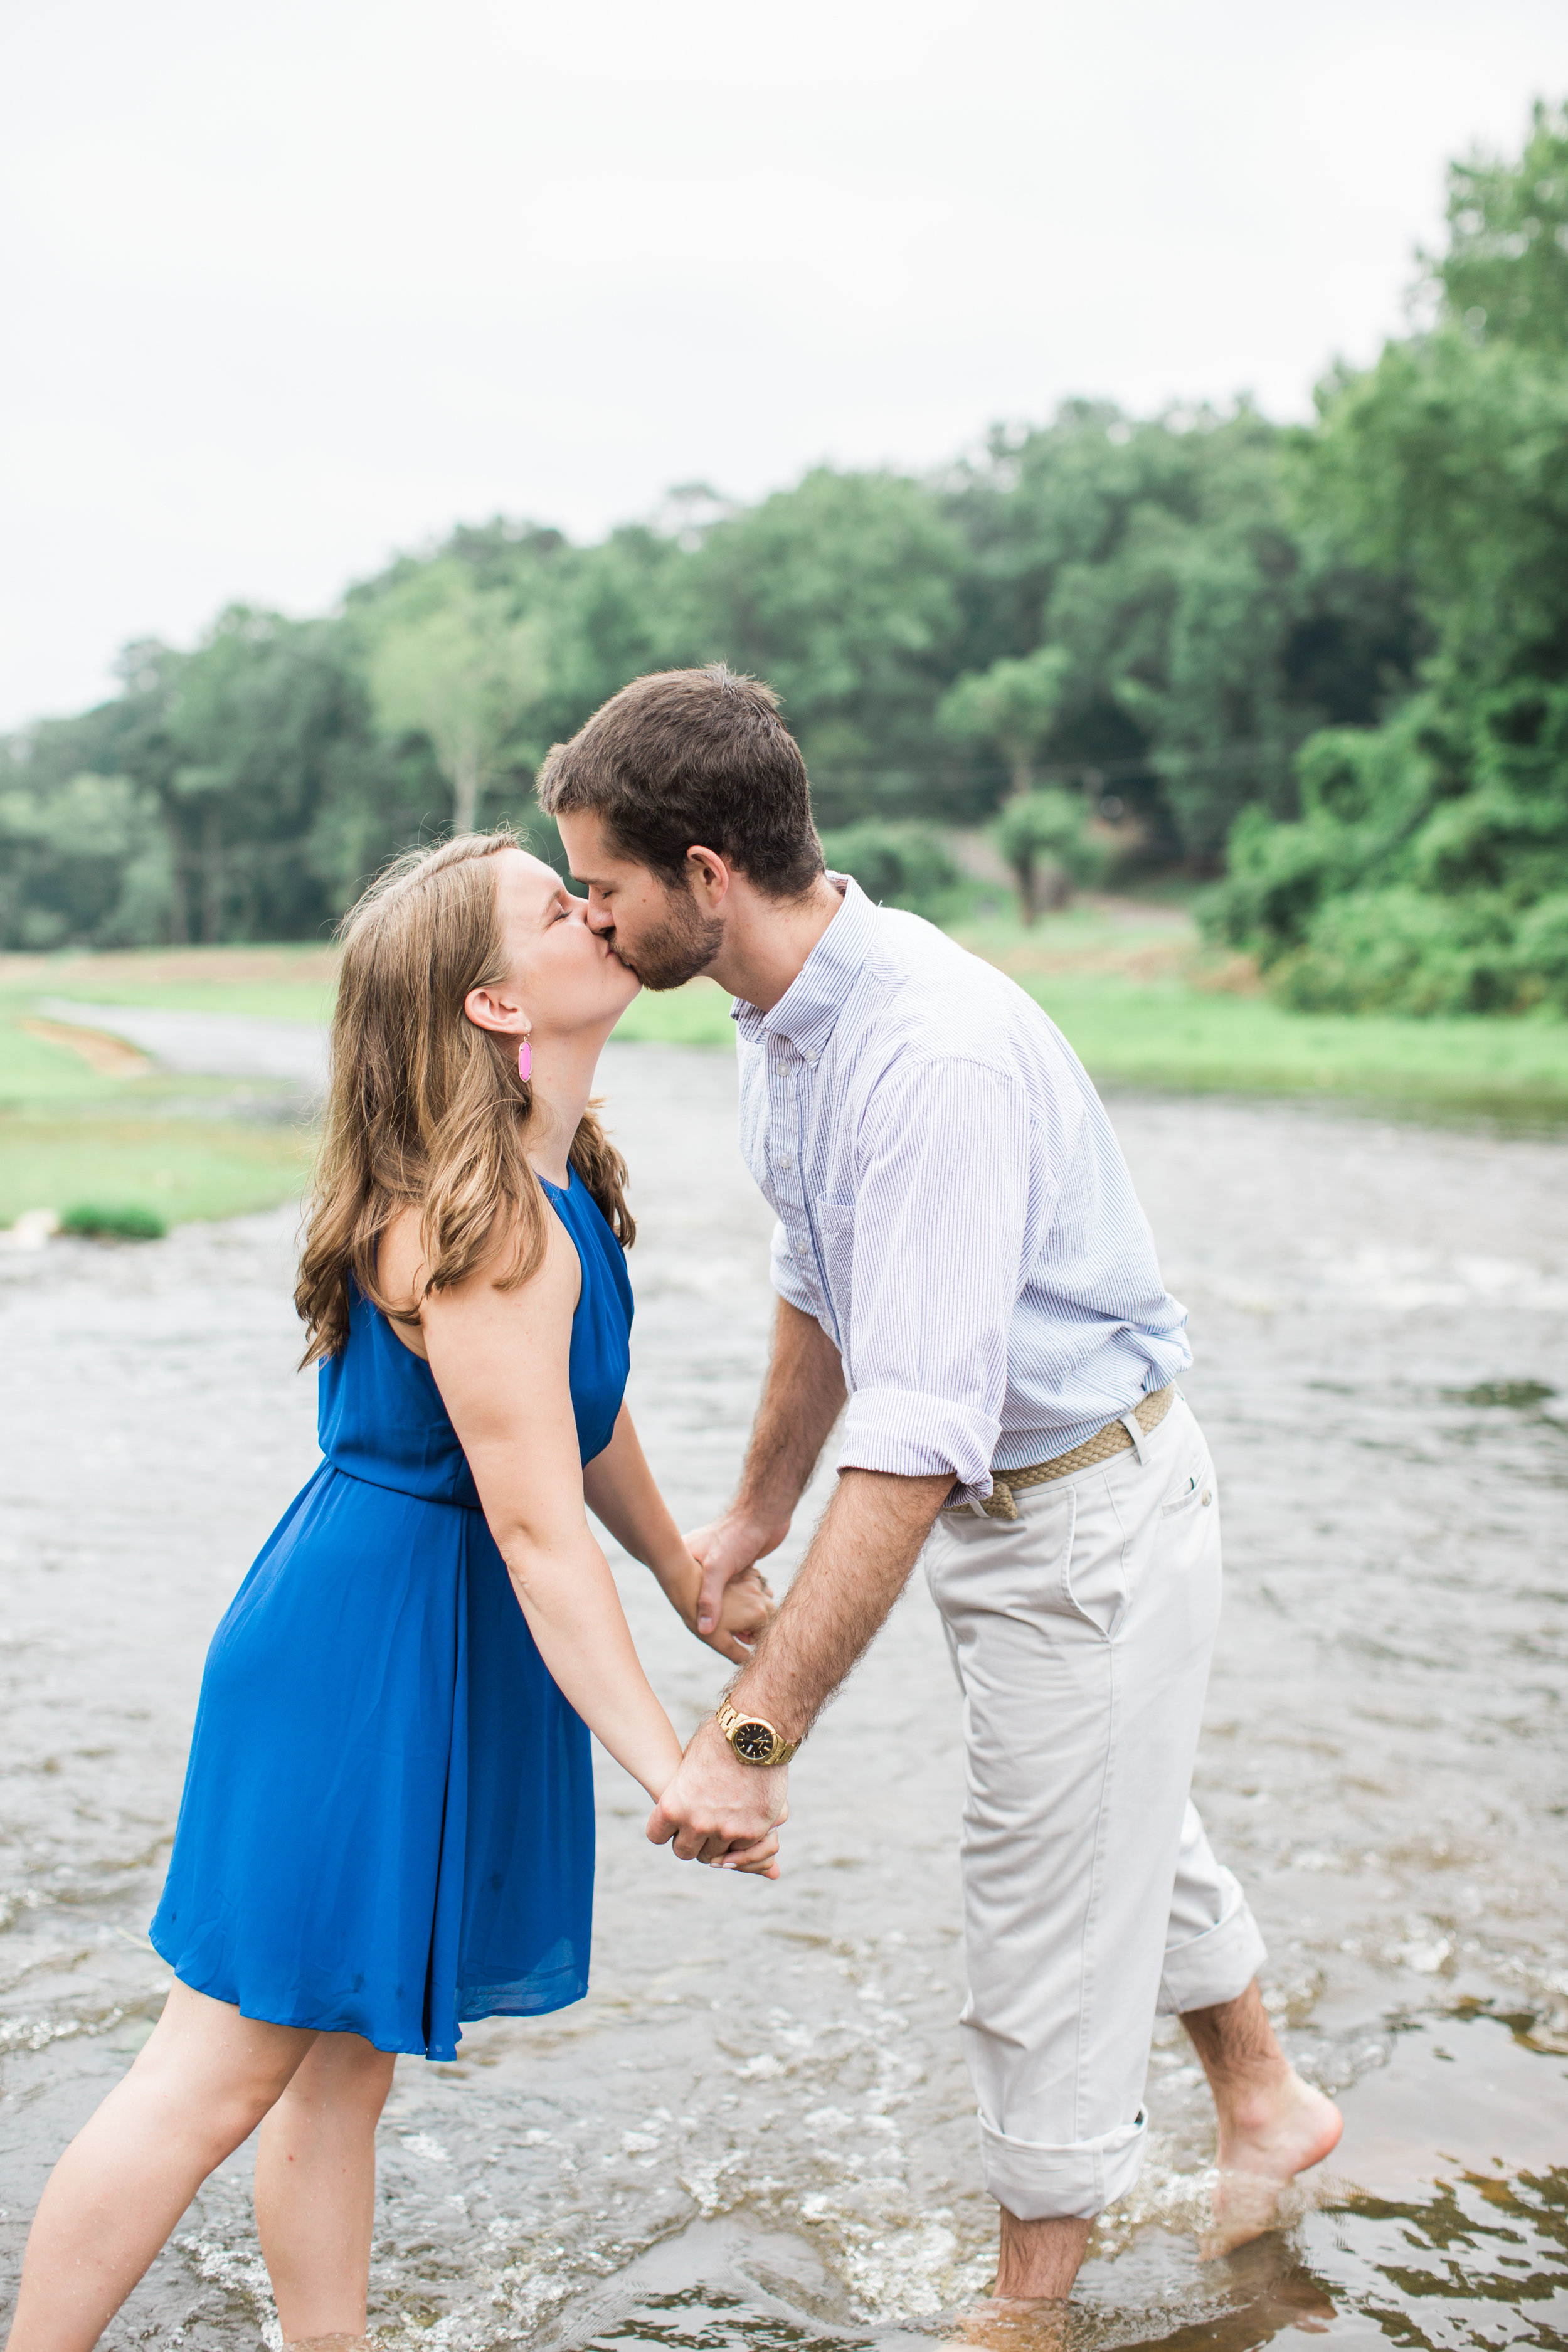 Matty-Drollette-Engagments-Montgomery-Alabama-Photographer-100.jpg